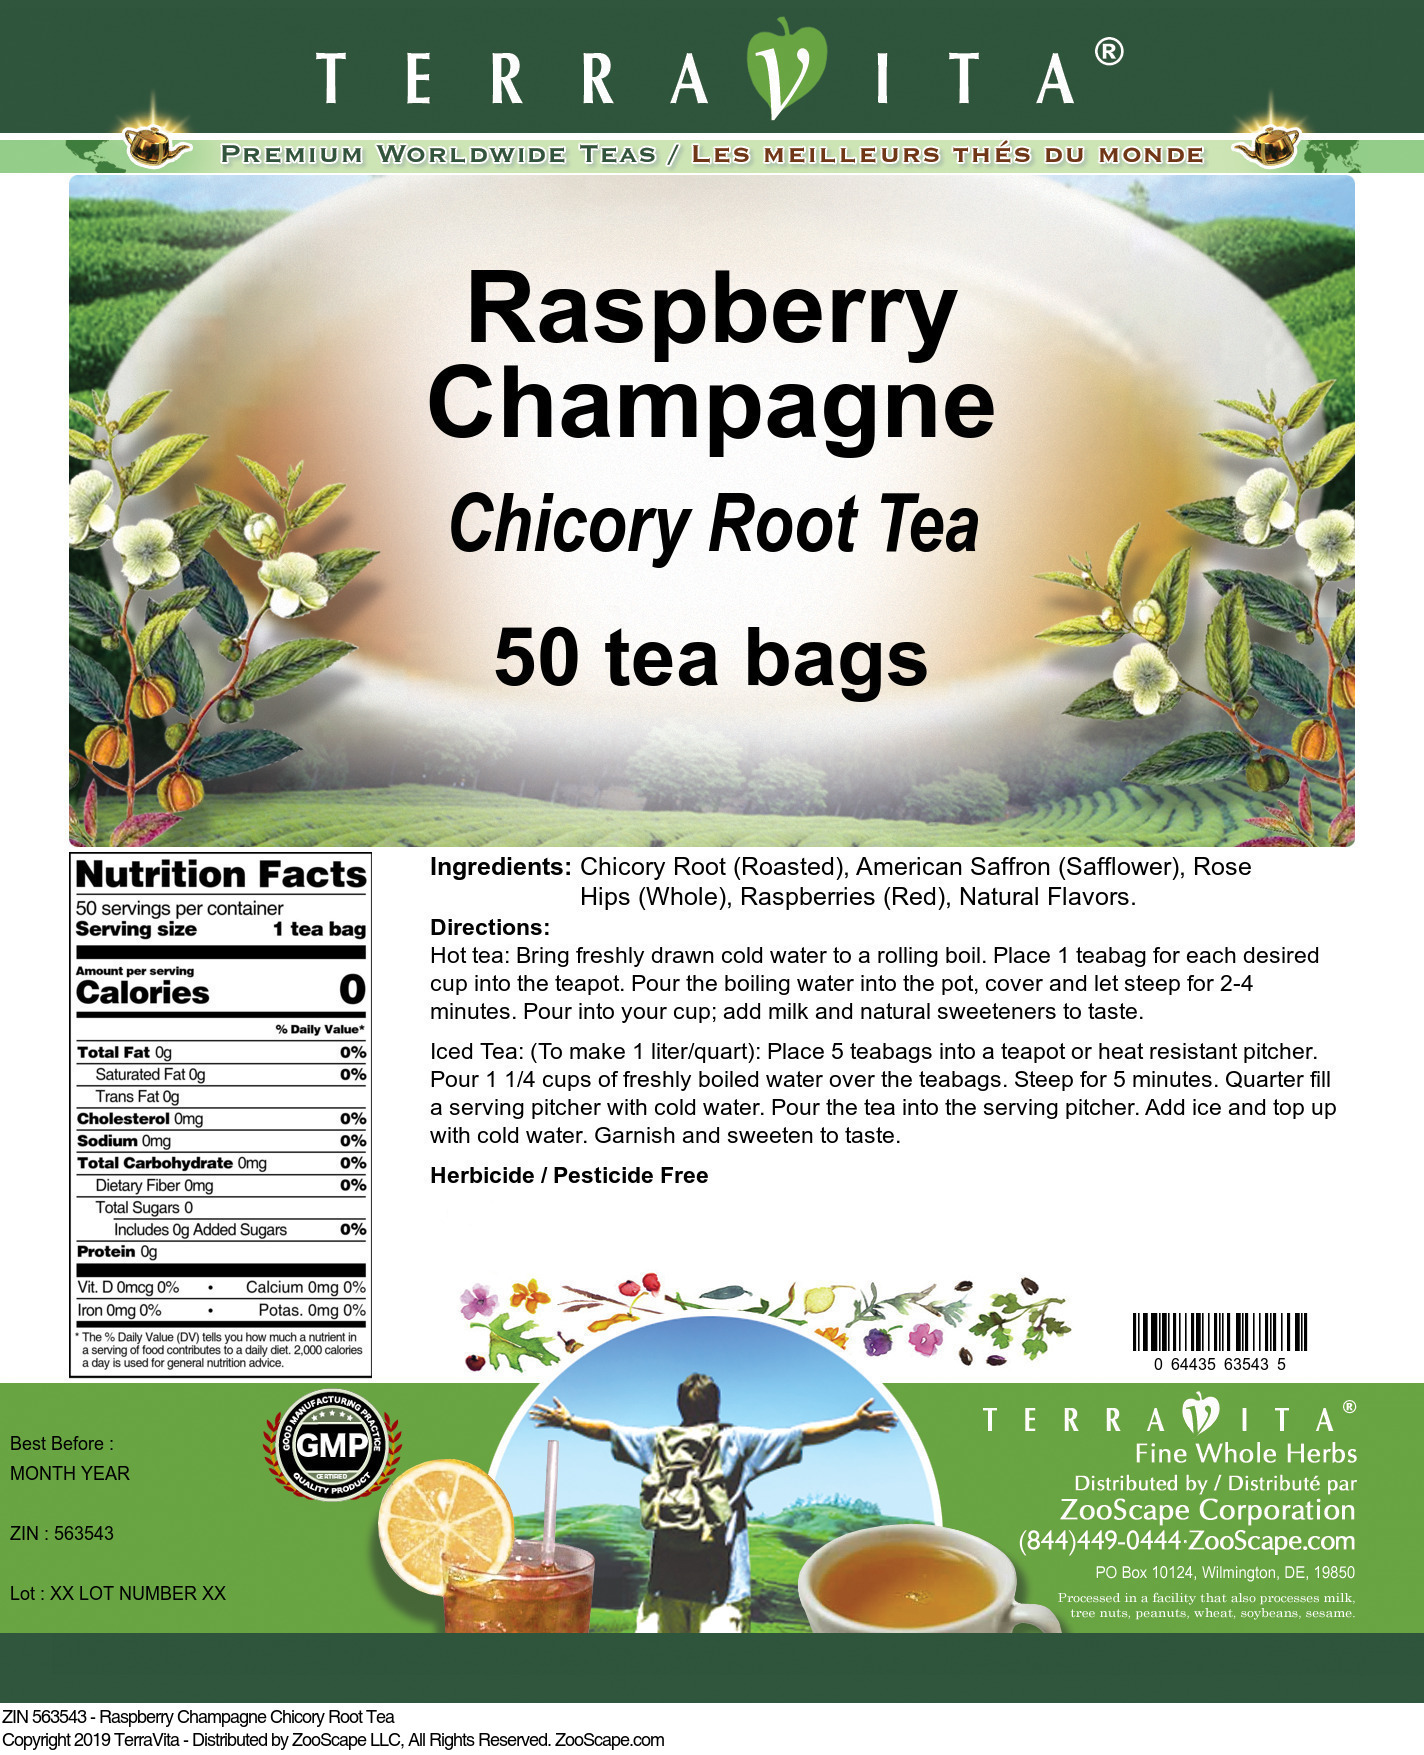 Raspberry Champagne Chicory Root Tea